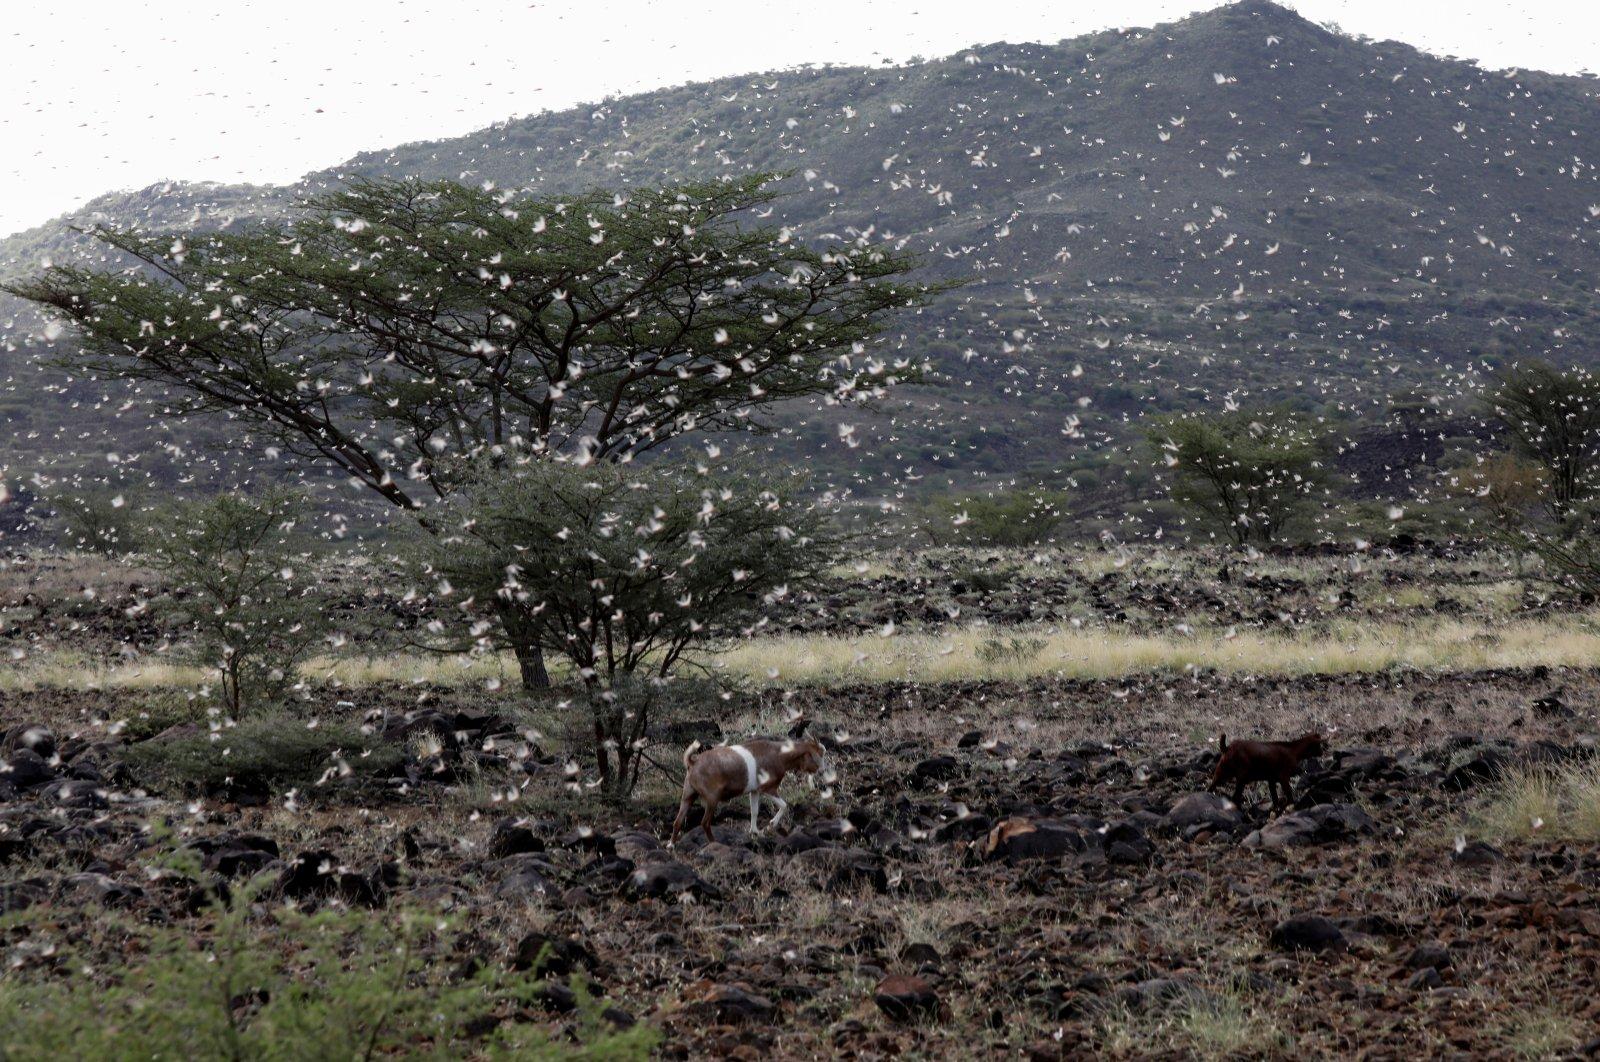 Goats walk as a locust swarm fly near the town of Lodwar, Turkana county, northwestern Kenya, June 28, 2020. (REUTERS Photo)